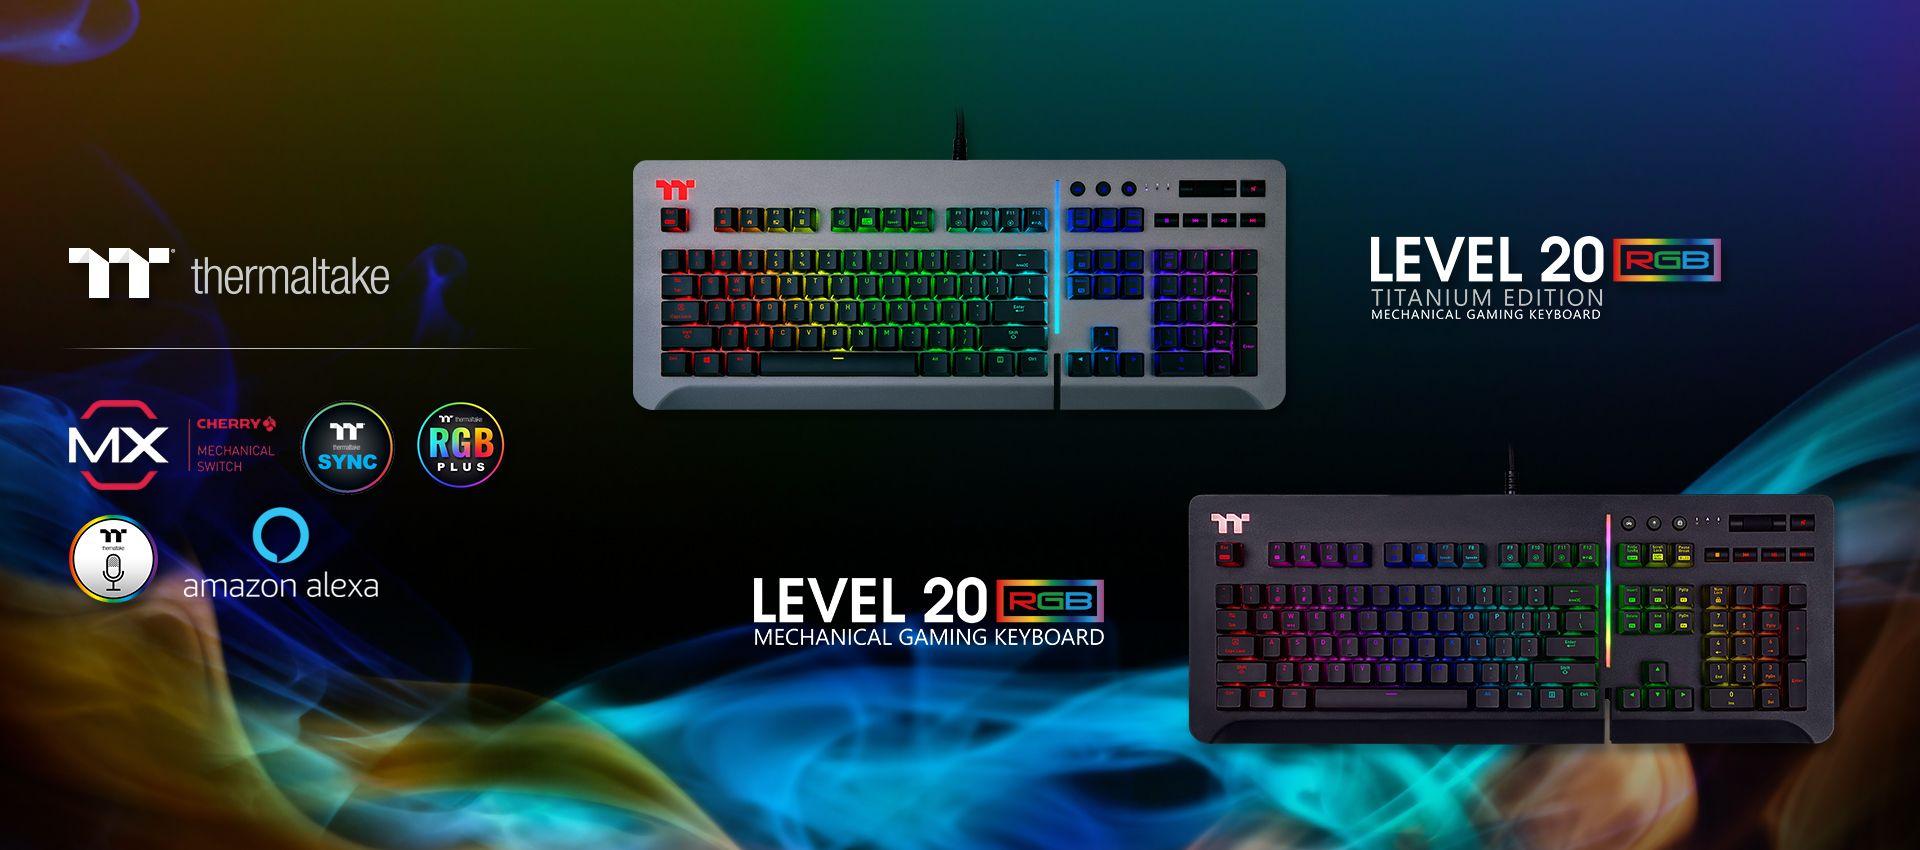 c488620b5f1 Level 20 RGB Titanium Gaming Keyboard (Speed Silver)